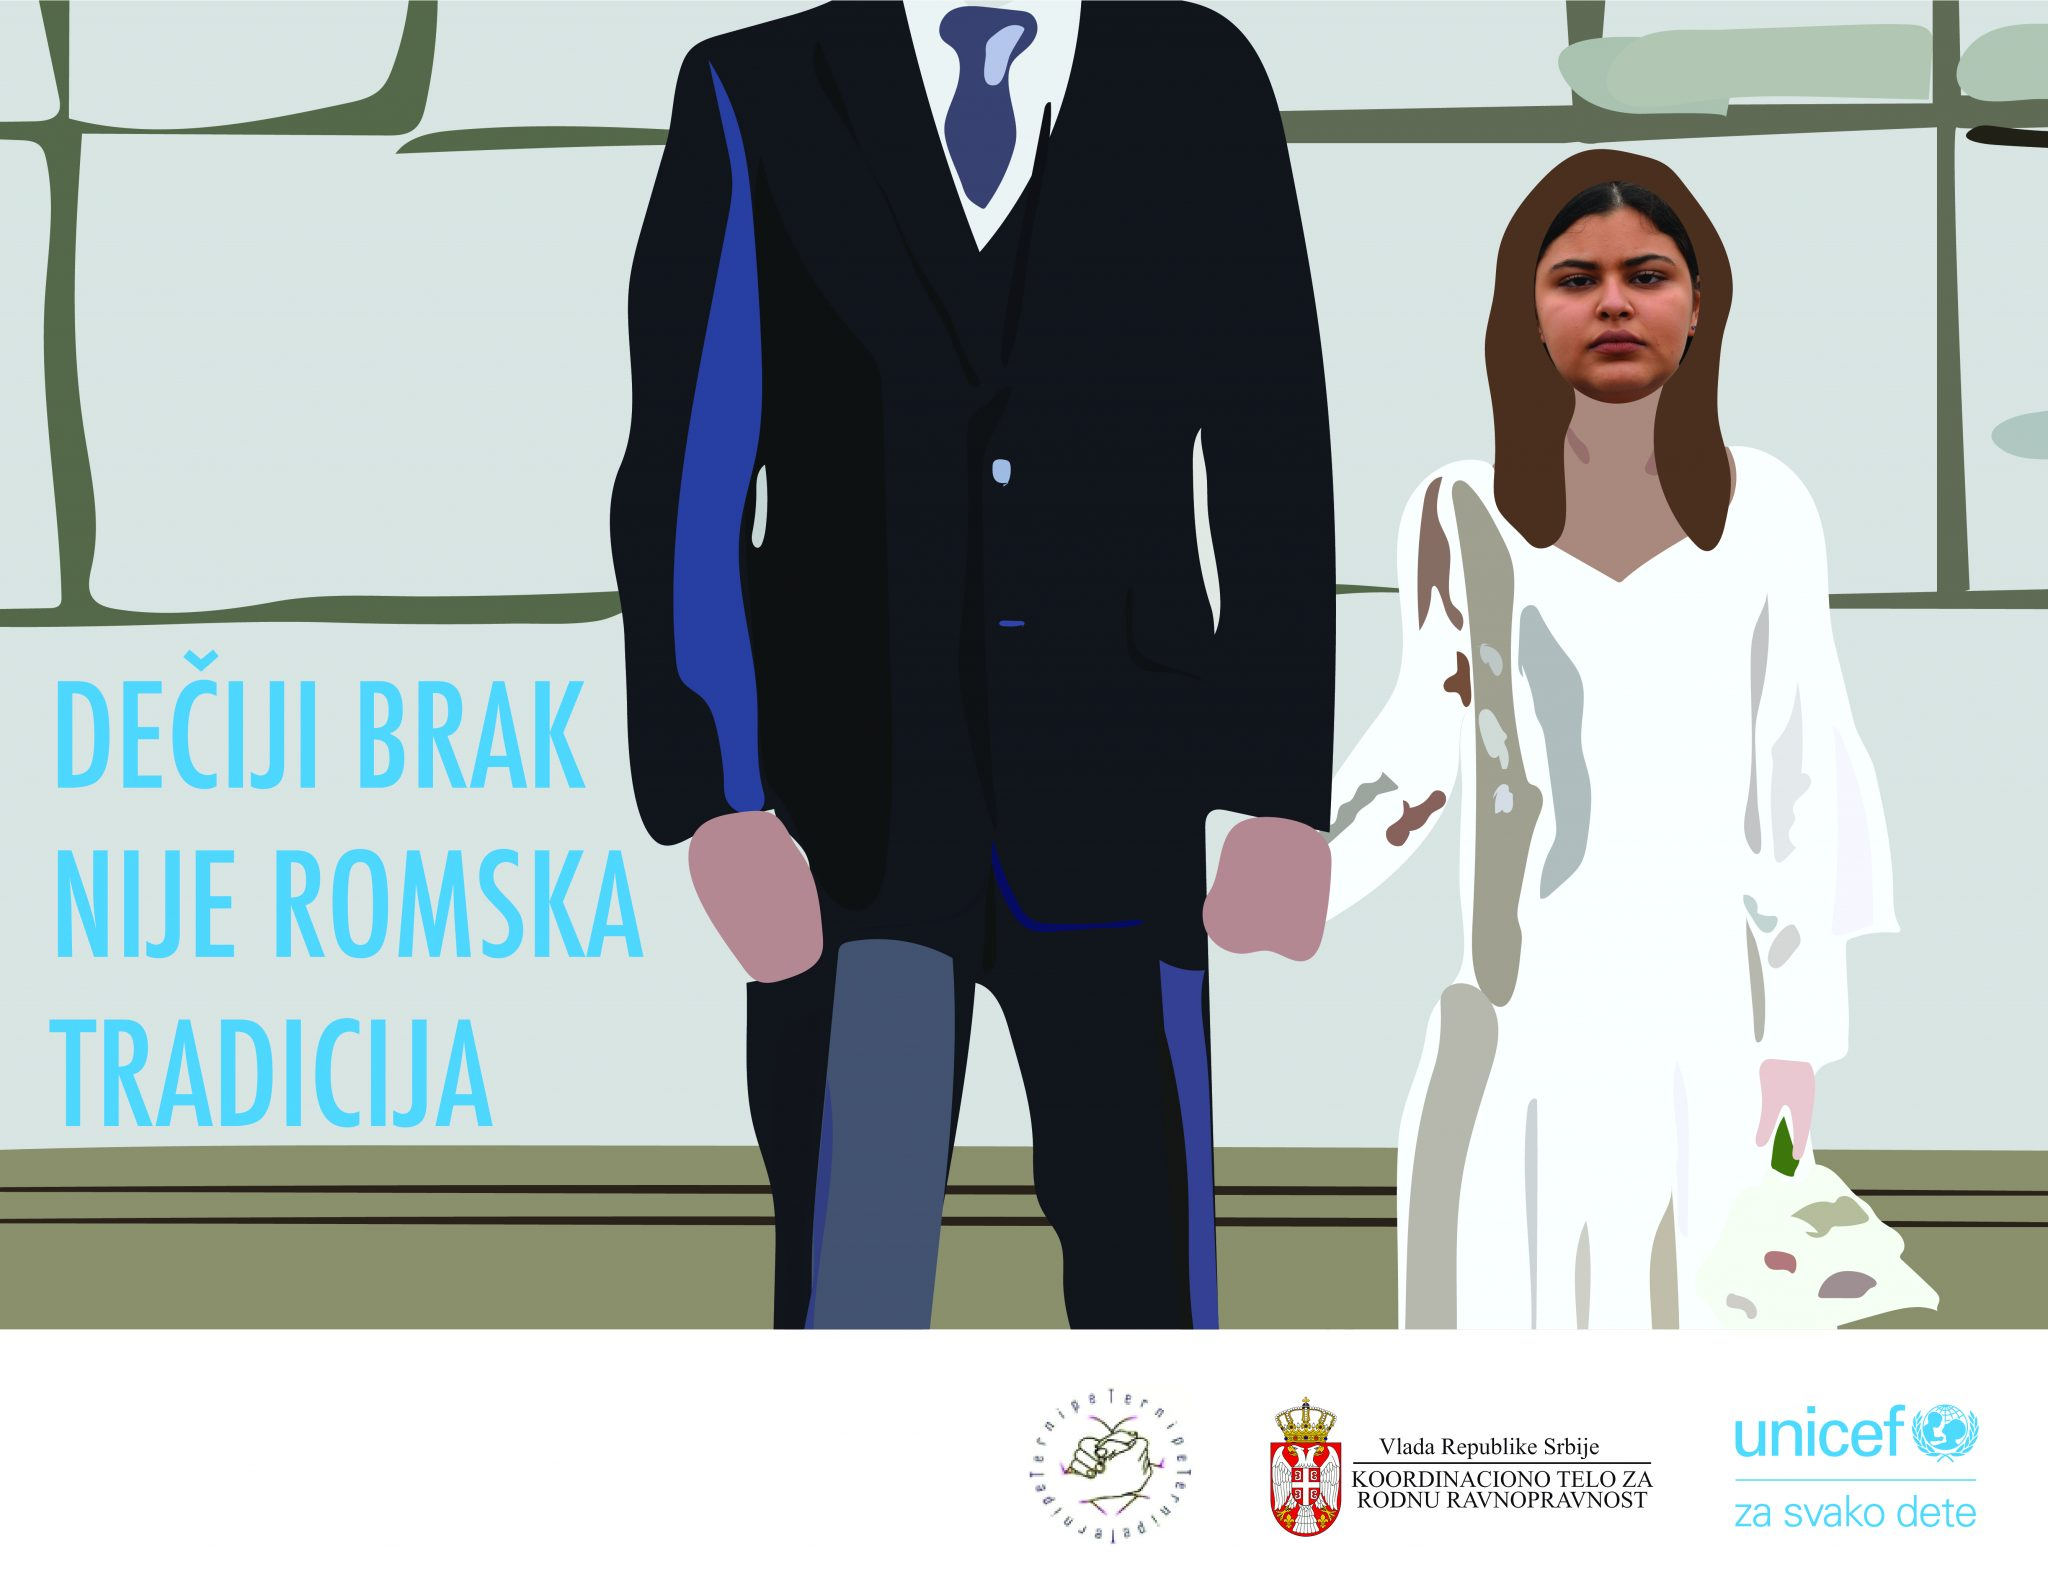 Dečiji brak nije romska tradicija